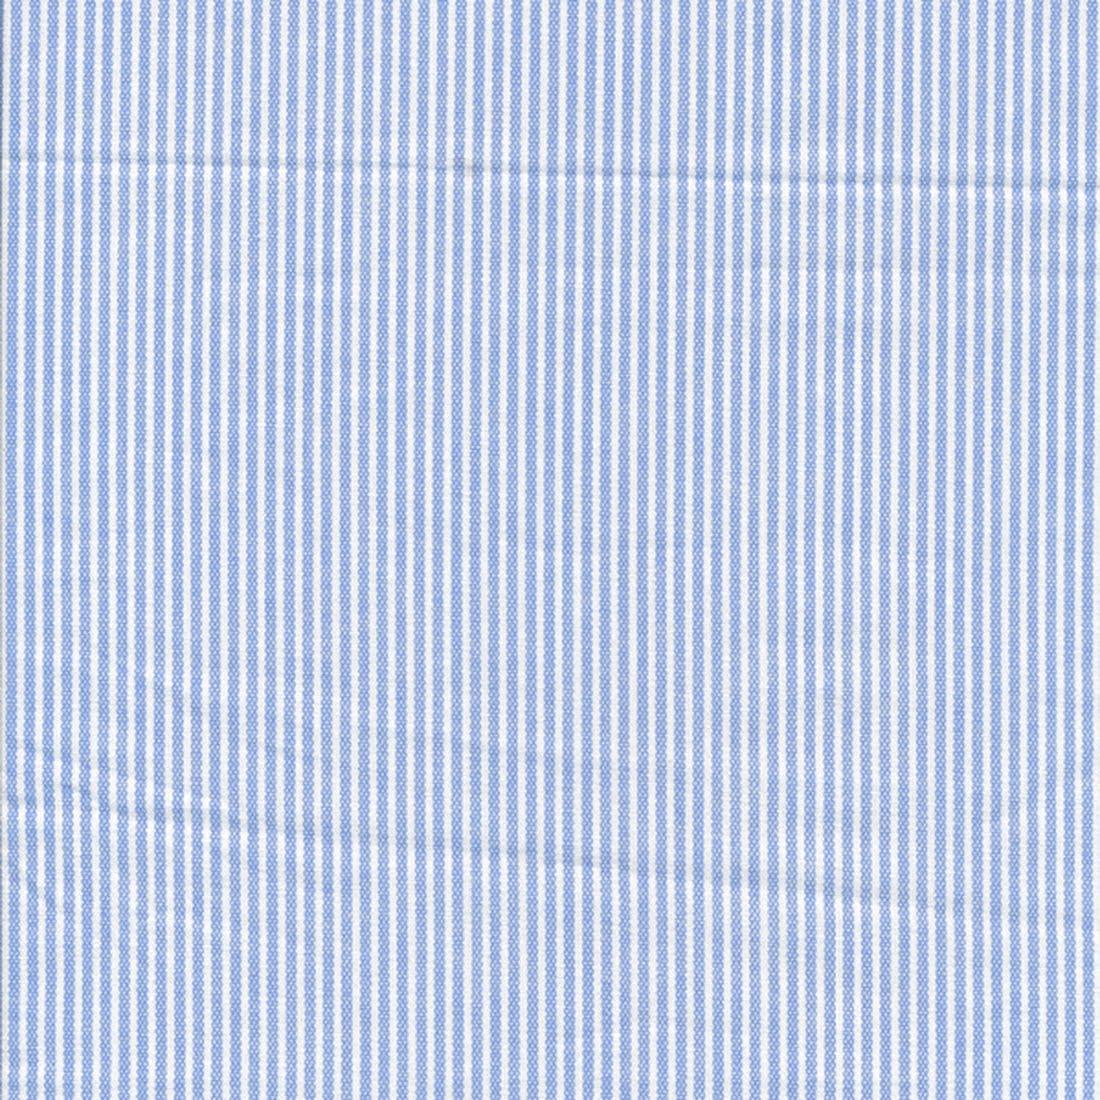 Wachstücher - Stripe French Blue